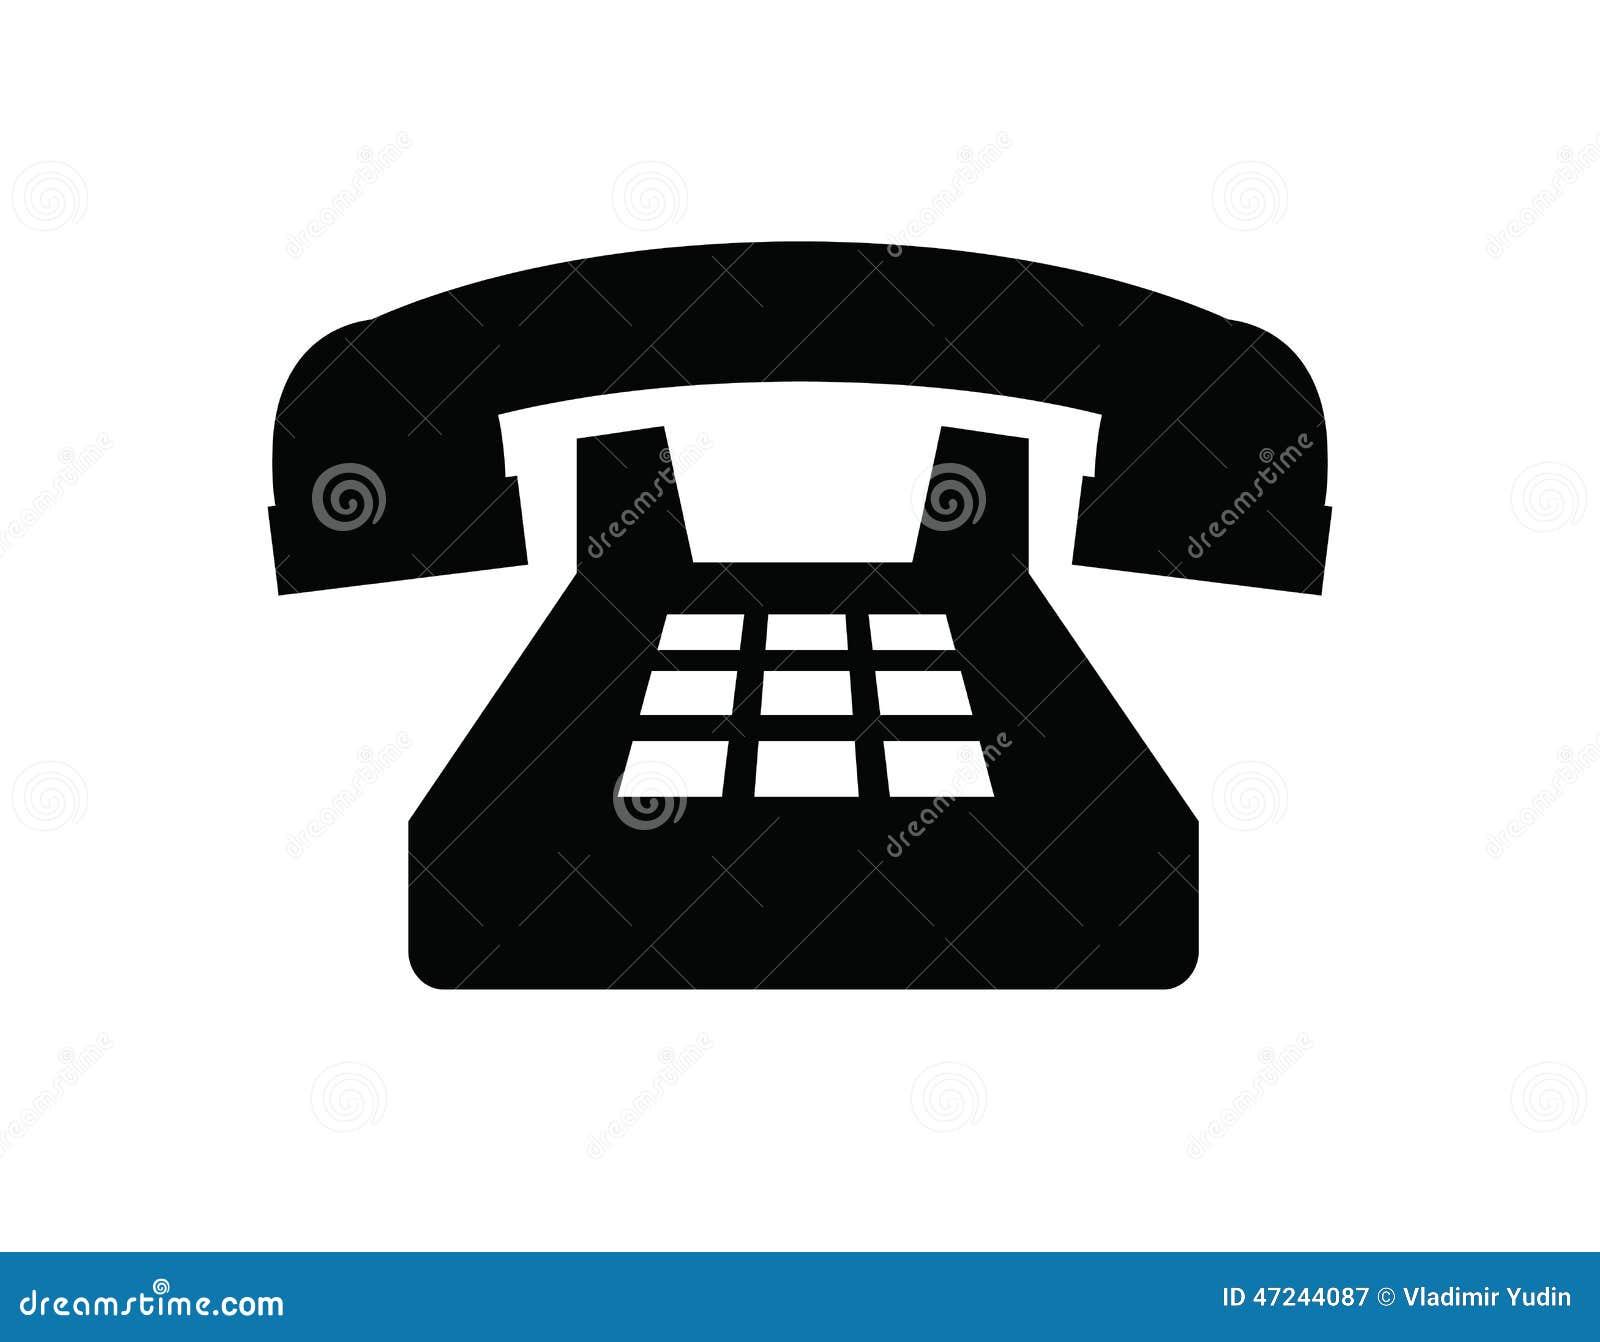 Vladimir Travel Phone Number